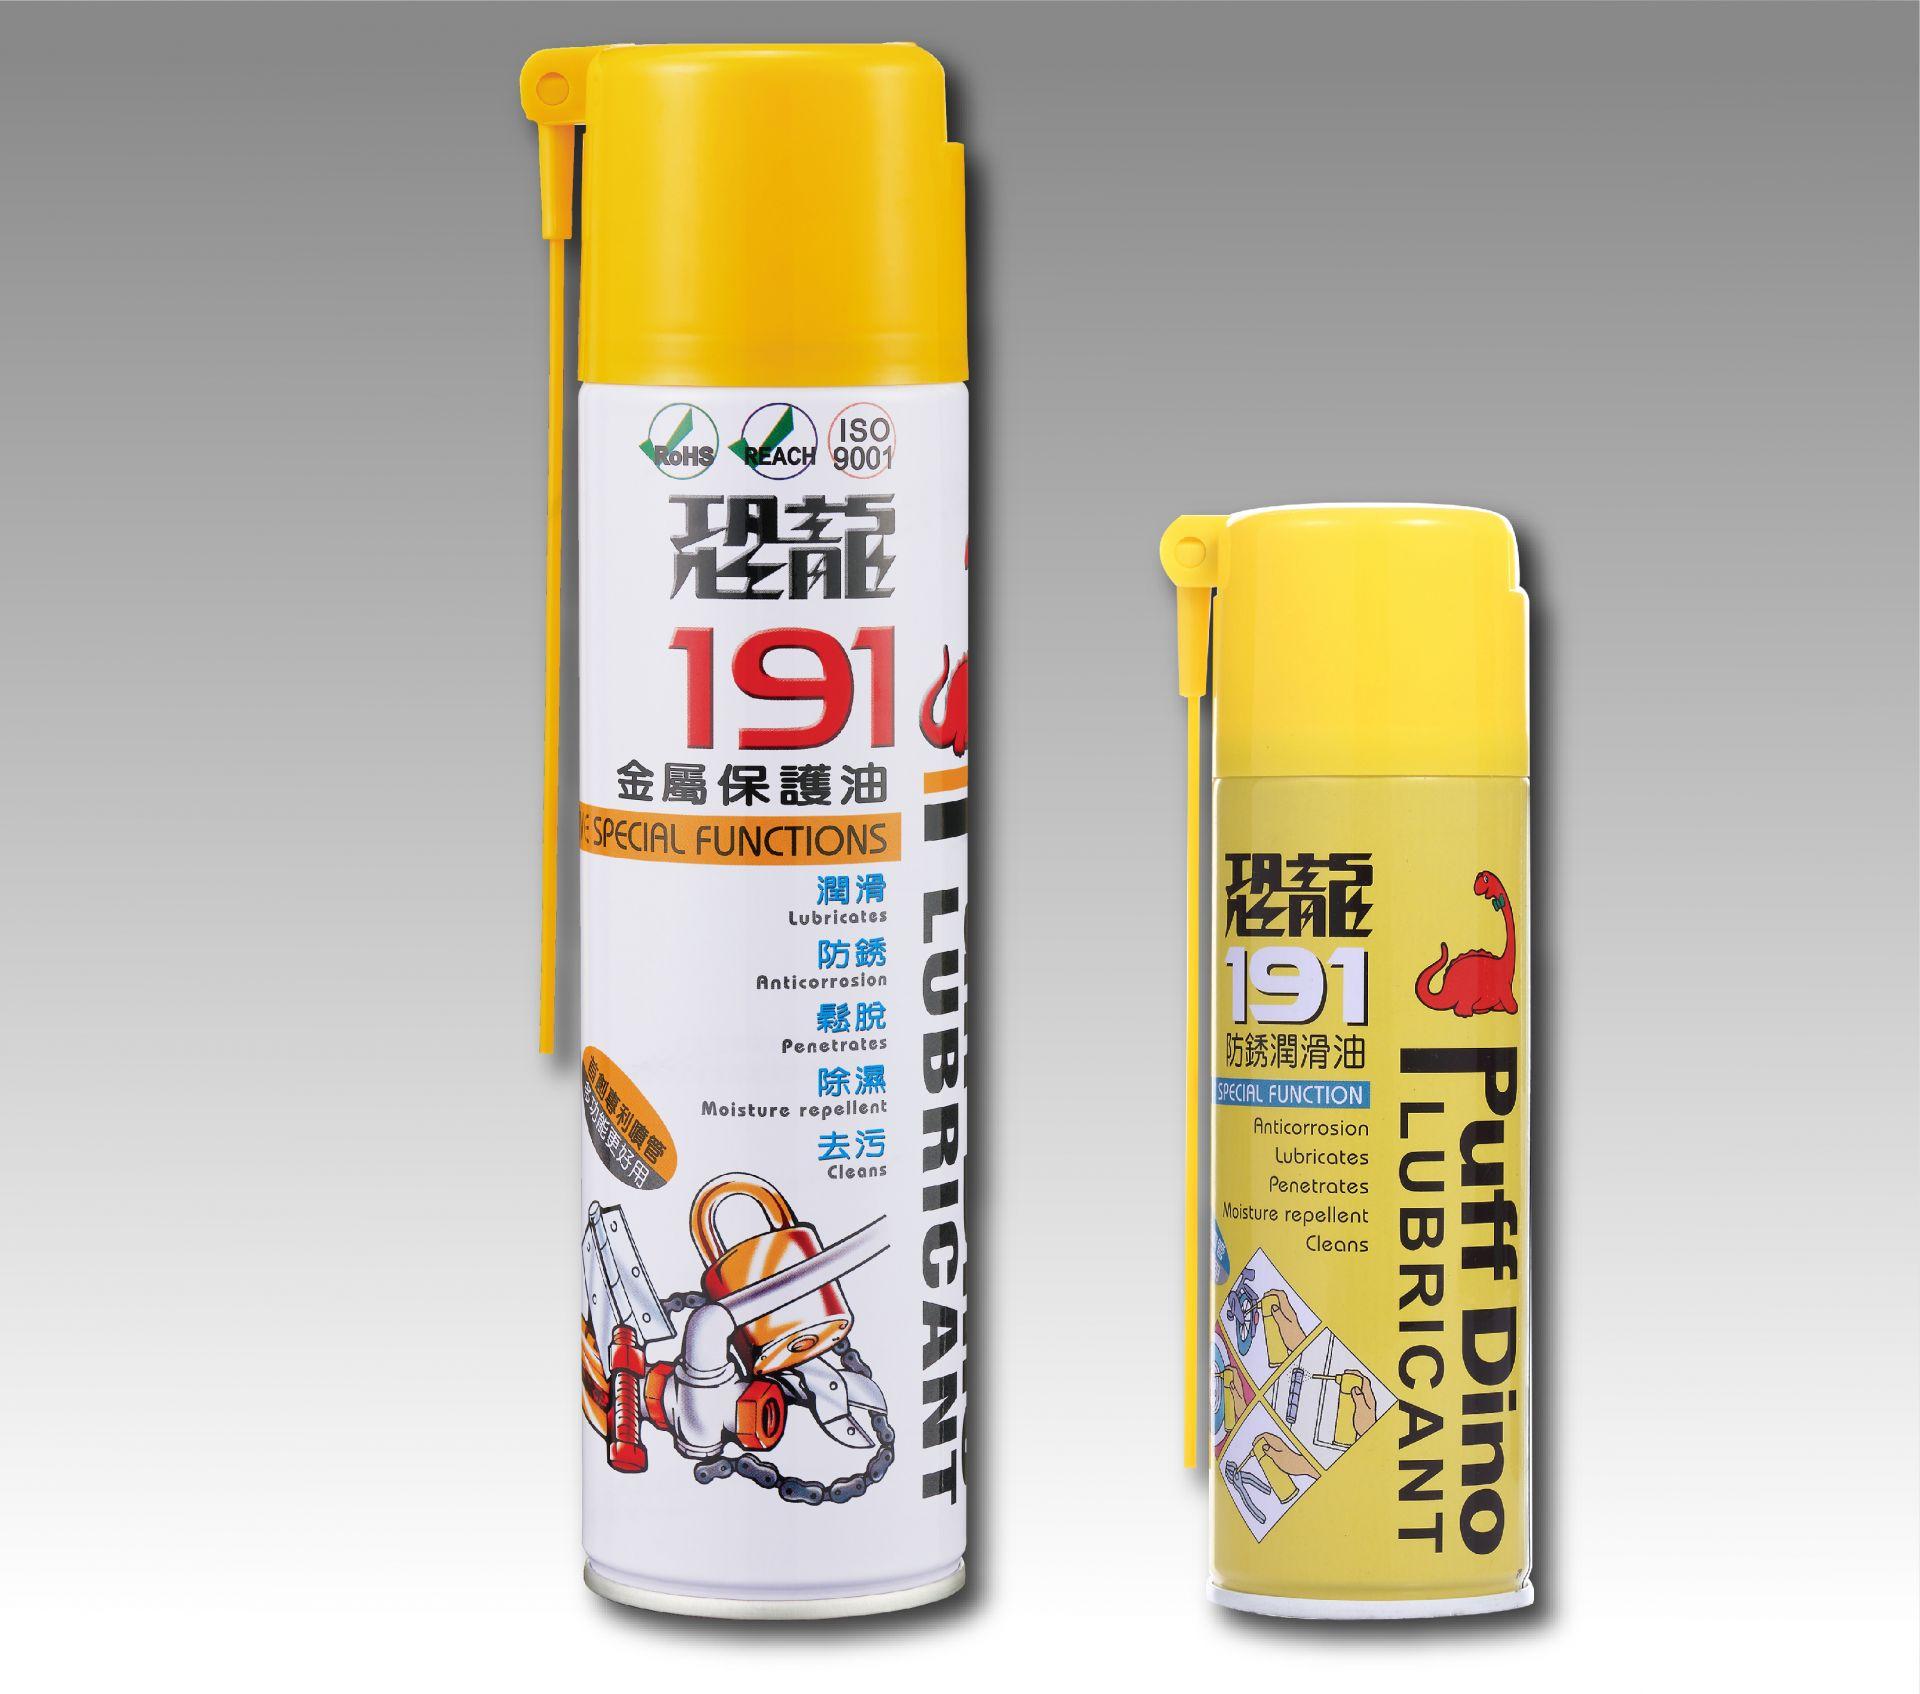 PUFF DINO 191 Anti-Rust & Lubricant - 191 Anti-Rust & Lubricant Spray